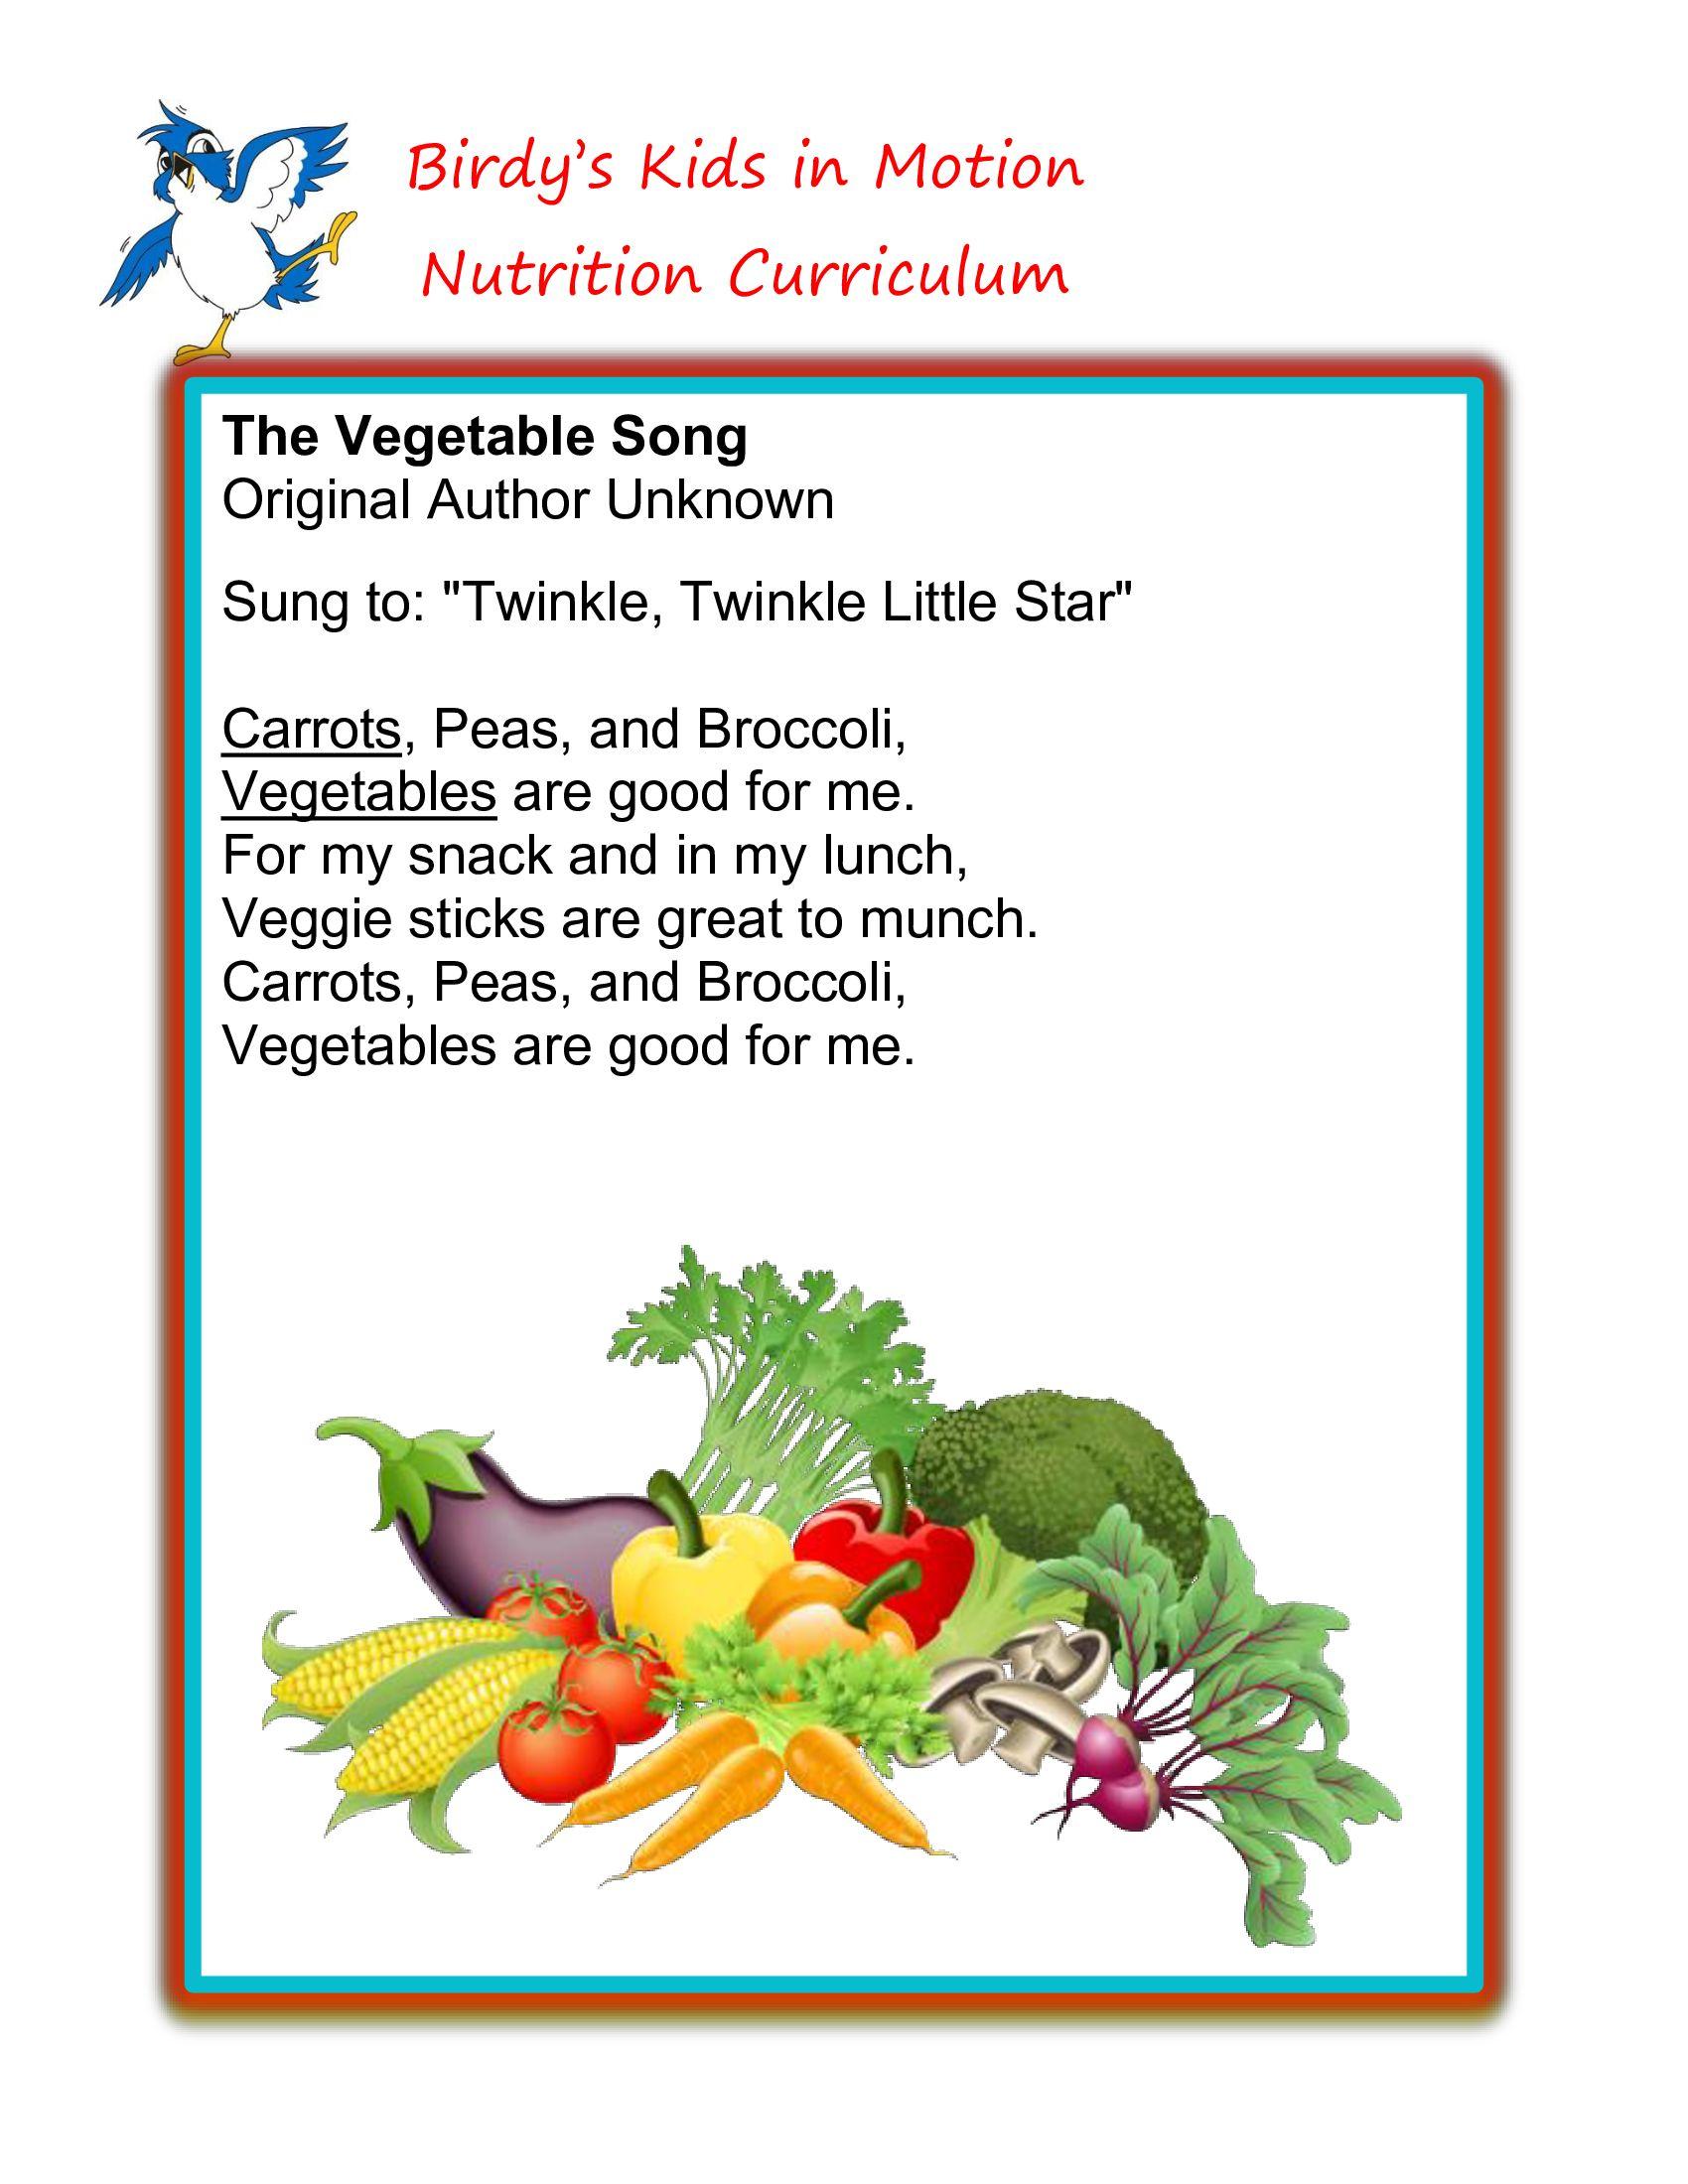 The Vegetable Song Birdyskidsinmotion